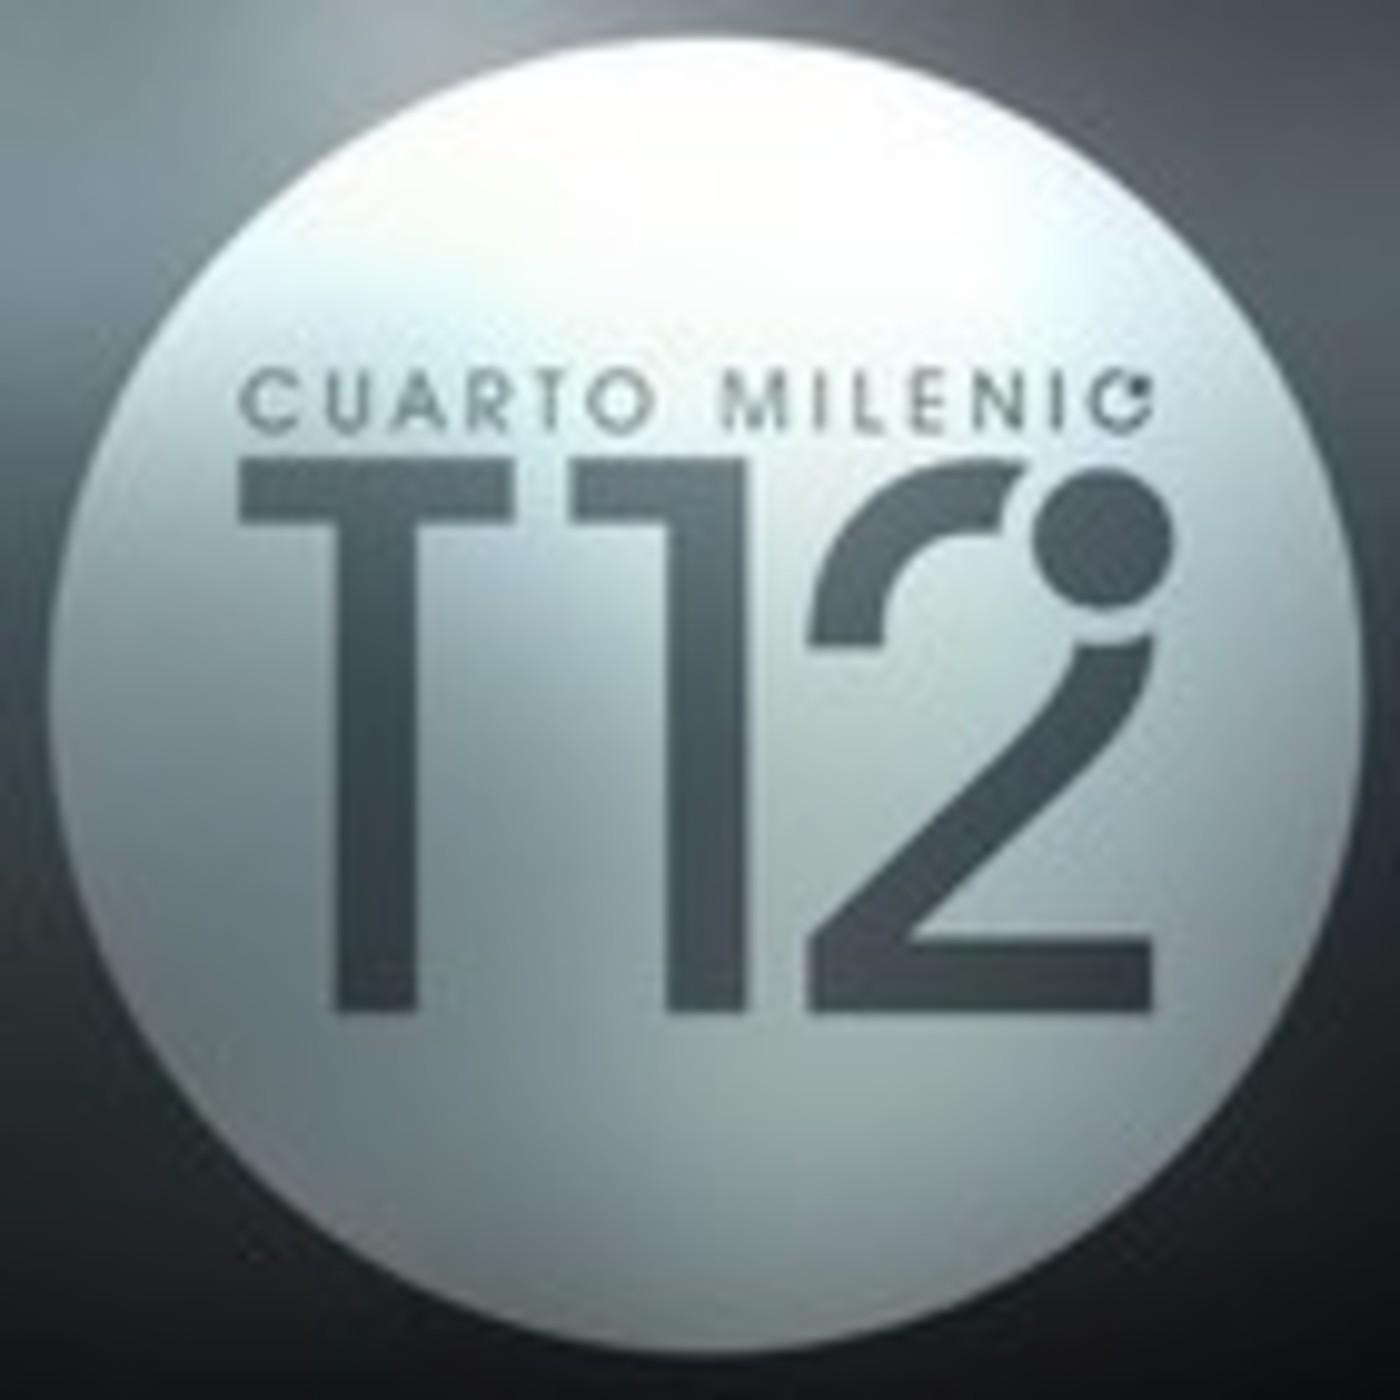 Cuarto milenio (12/2/2017) 12x24: Debate videncia • Radium Girls ...